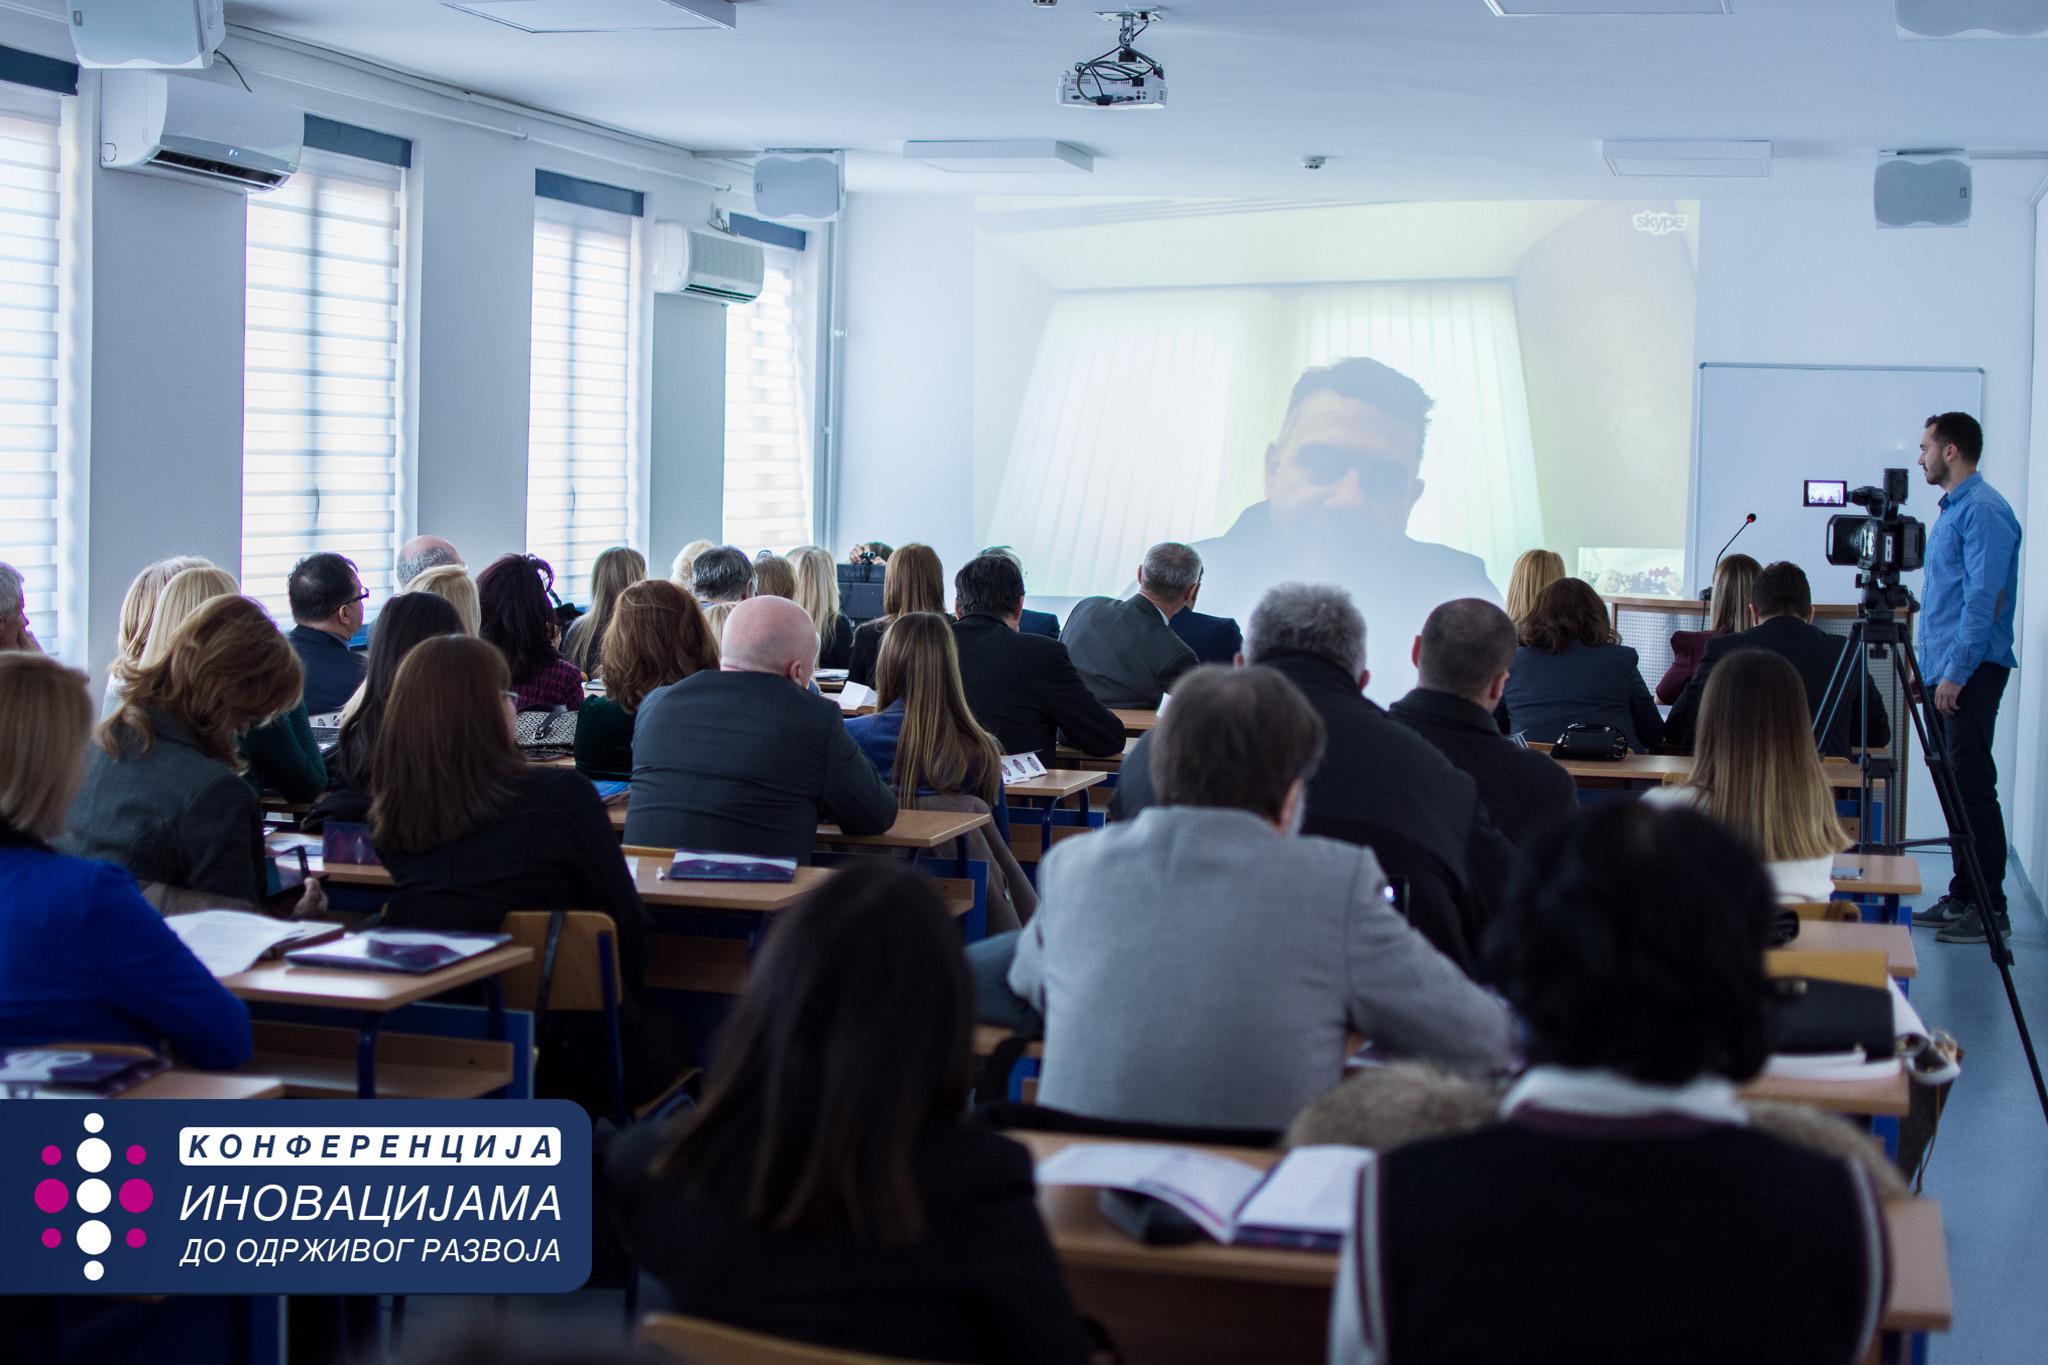 Ibrahim Obhodzas - Univerzitet vitez - BiH - MEF Fakultet